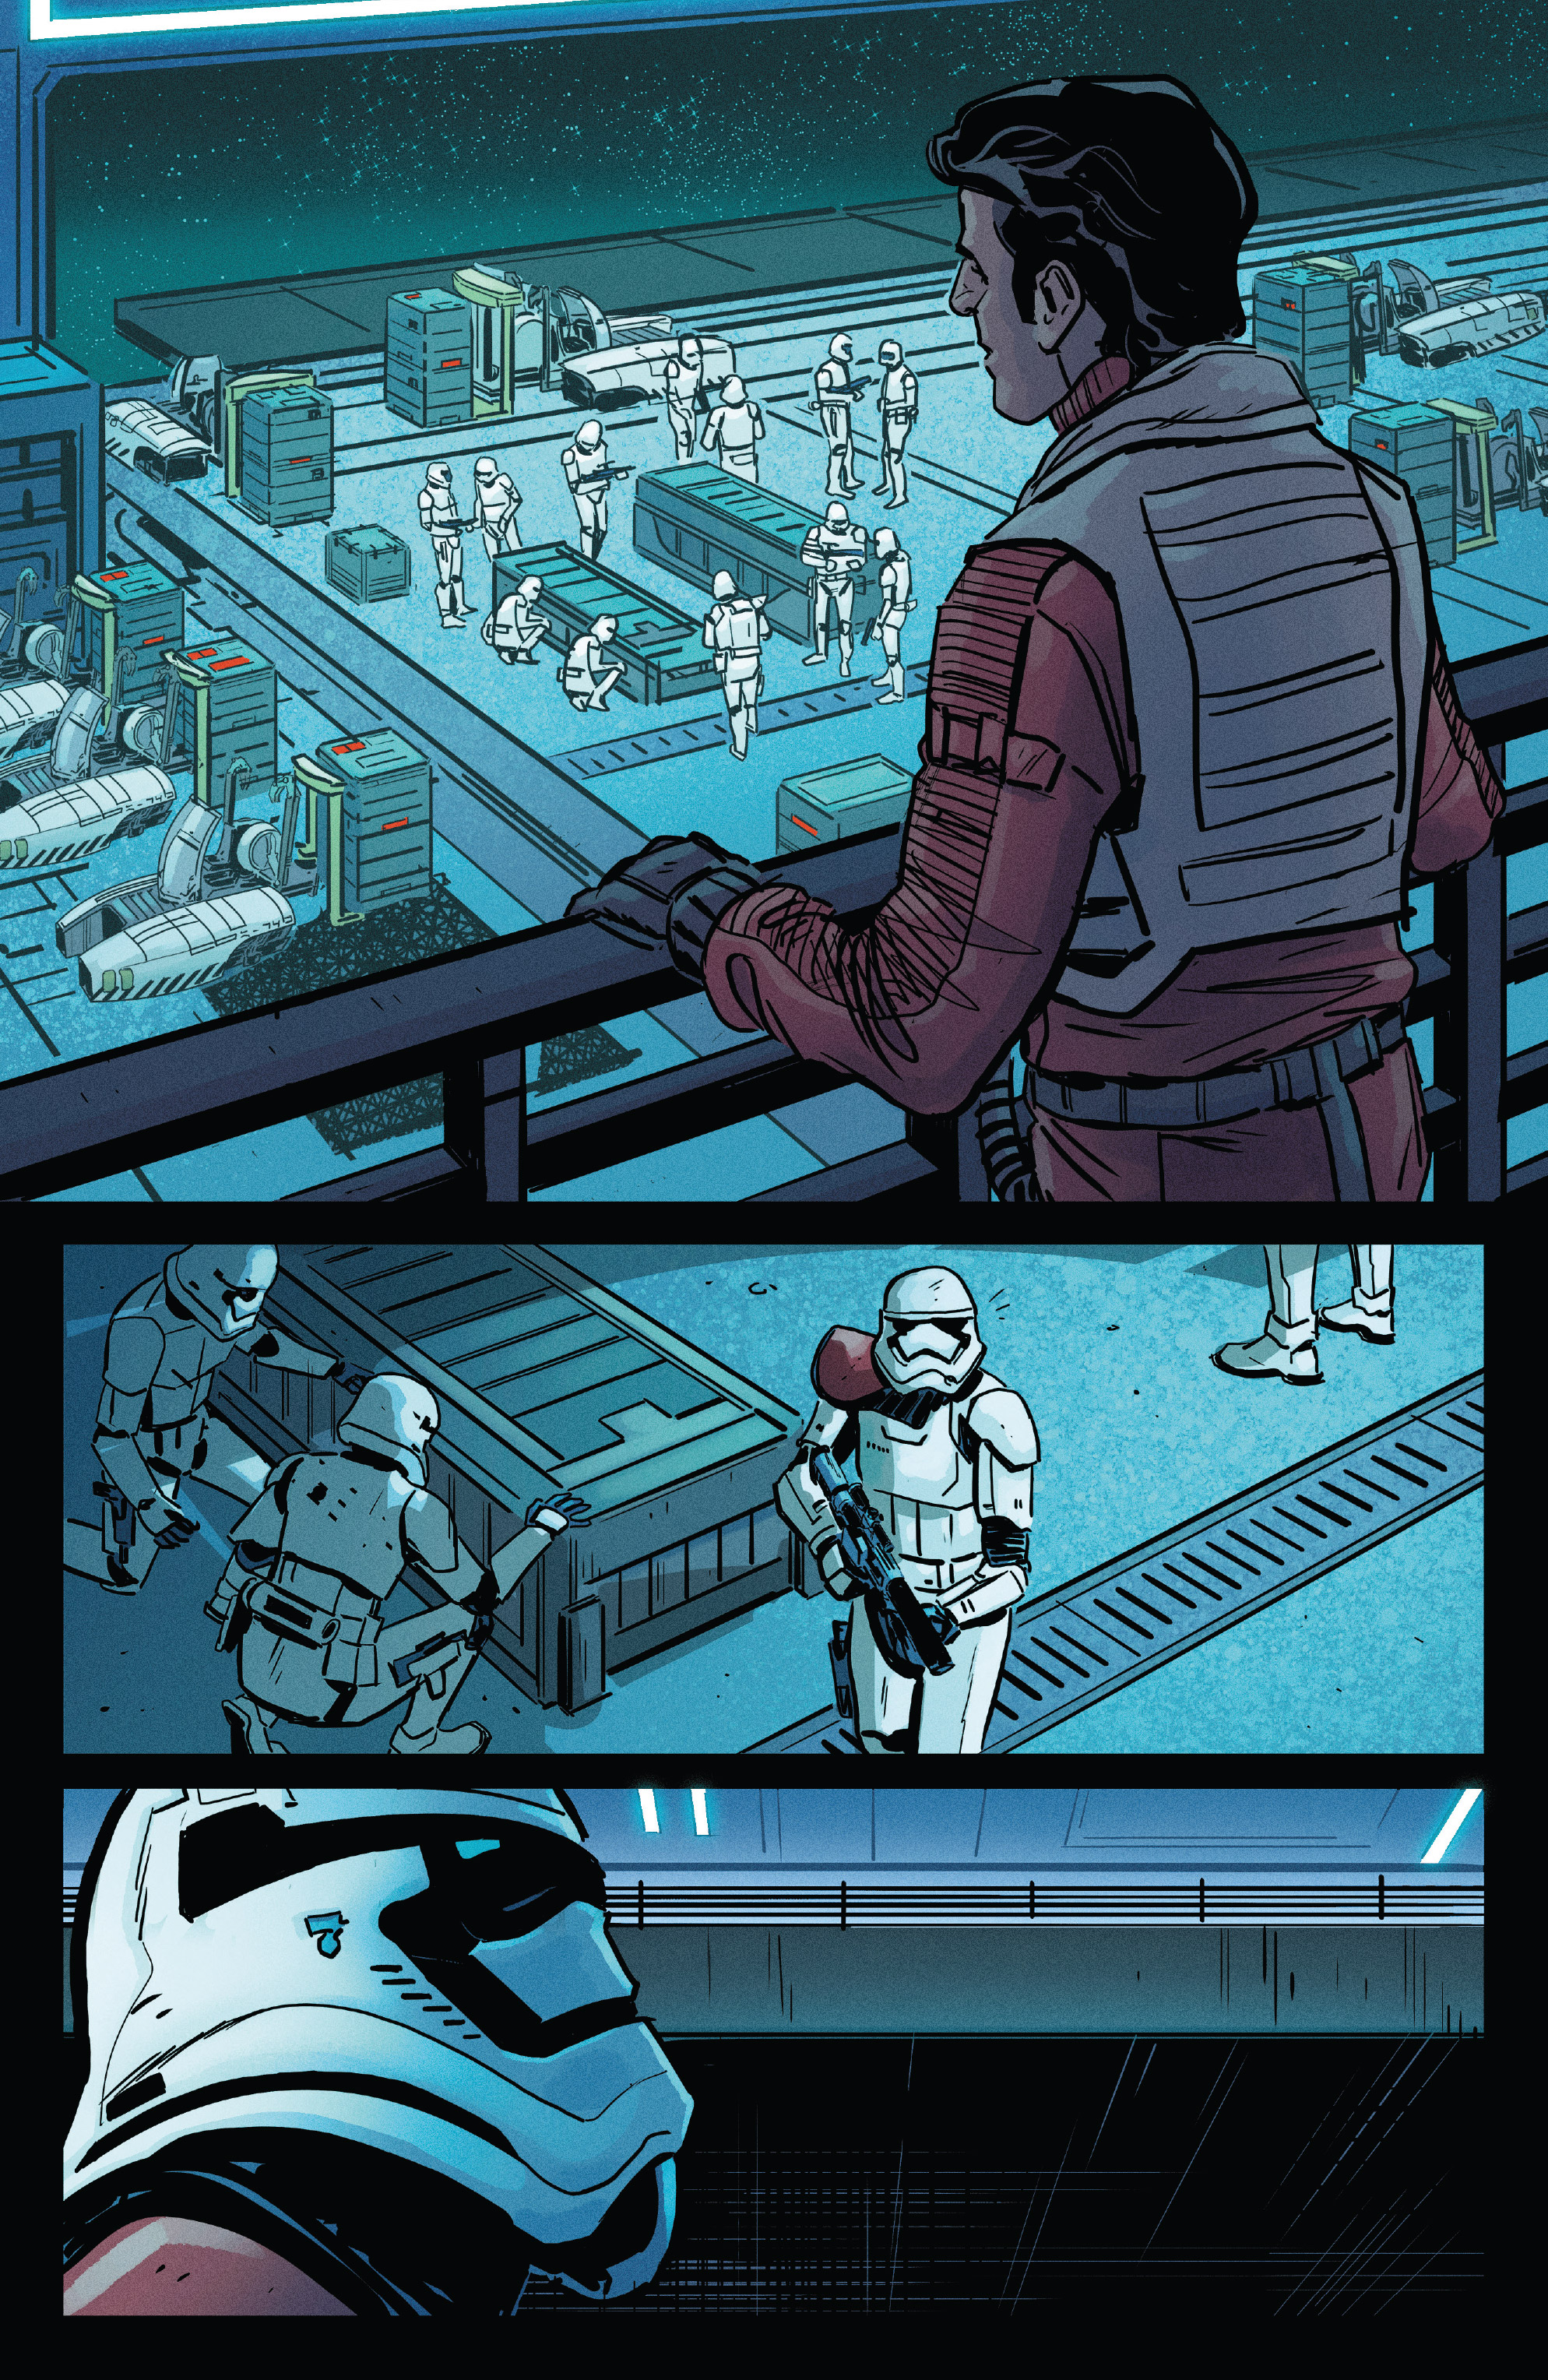 Read online Star Wars: Poe Dameron comic -  Issue # _Annual 1 - 15